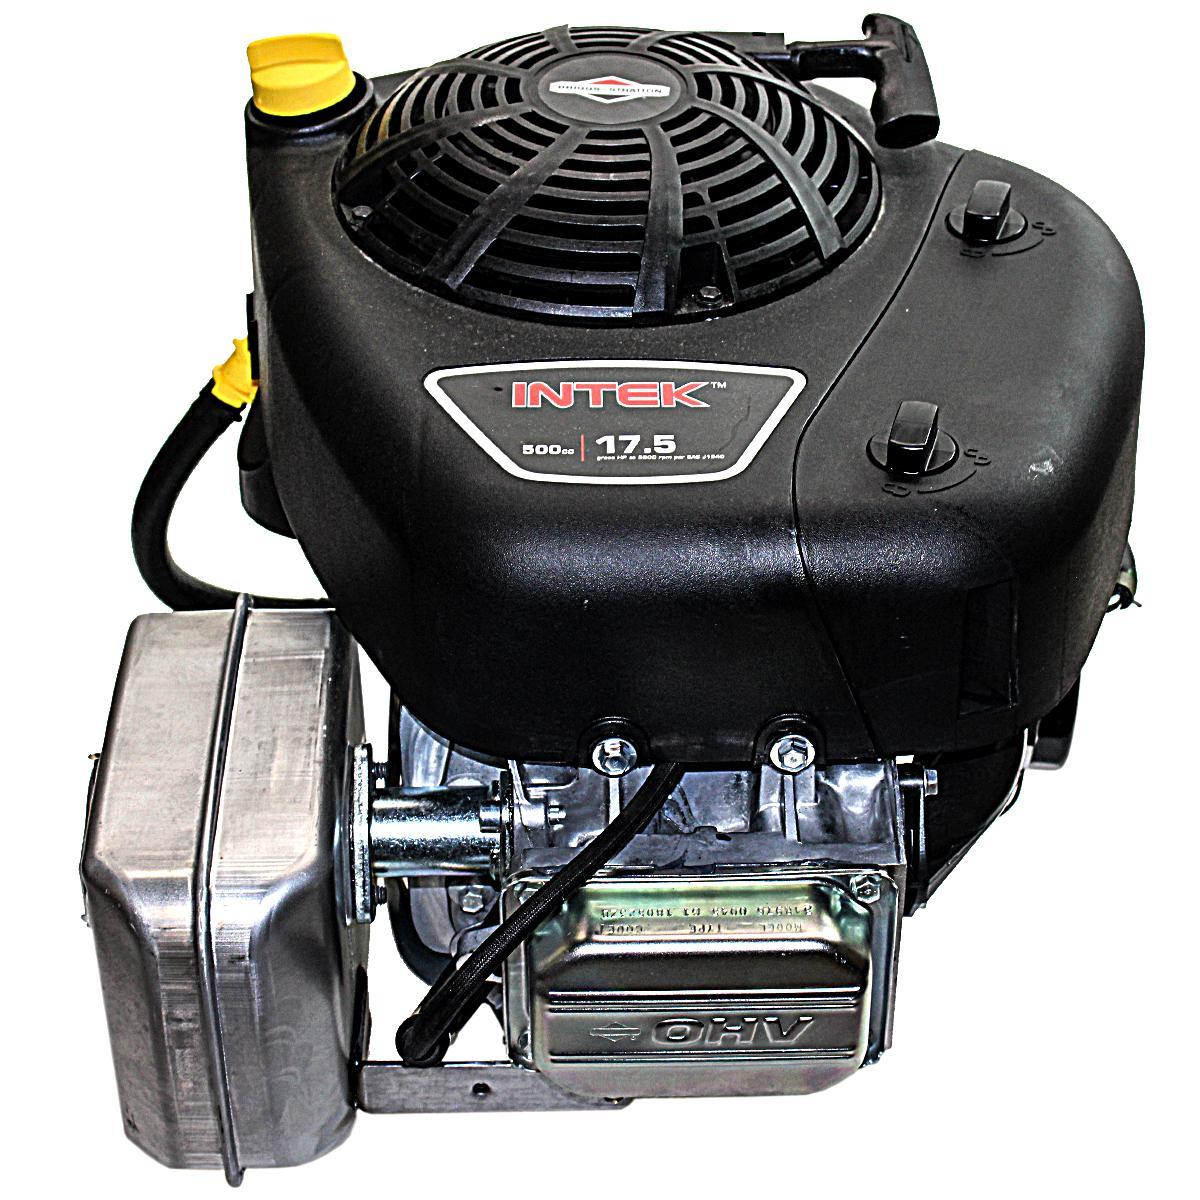 "17.5HP Vertical 1"" x 3 5/32"" Shaft, Intek, OHV, Recoil Start, 9 Amp Alternator, Oil Filter, Muffler, Fuel Pump, Briggs   Stratto"